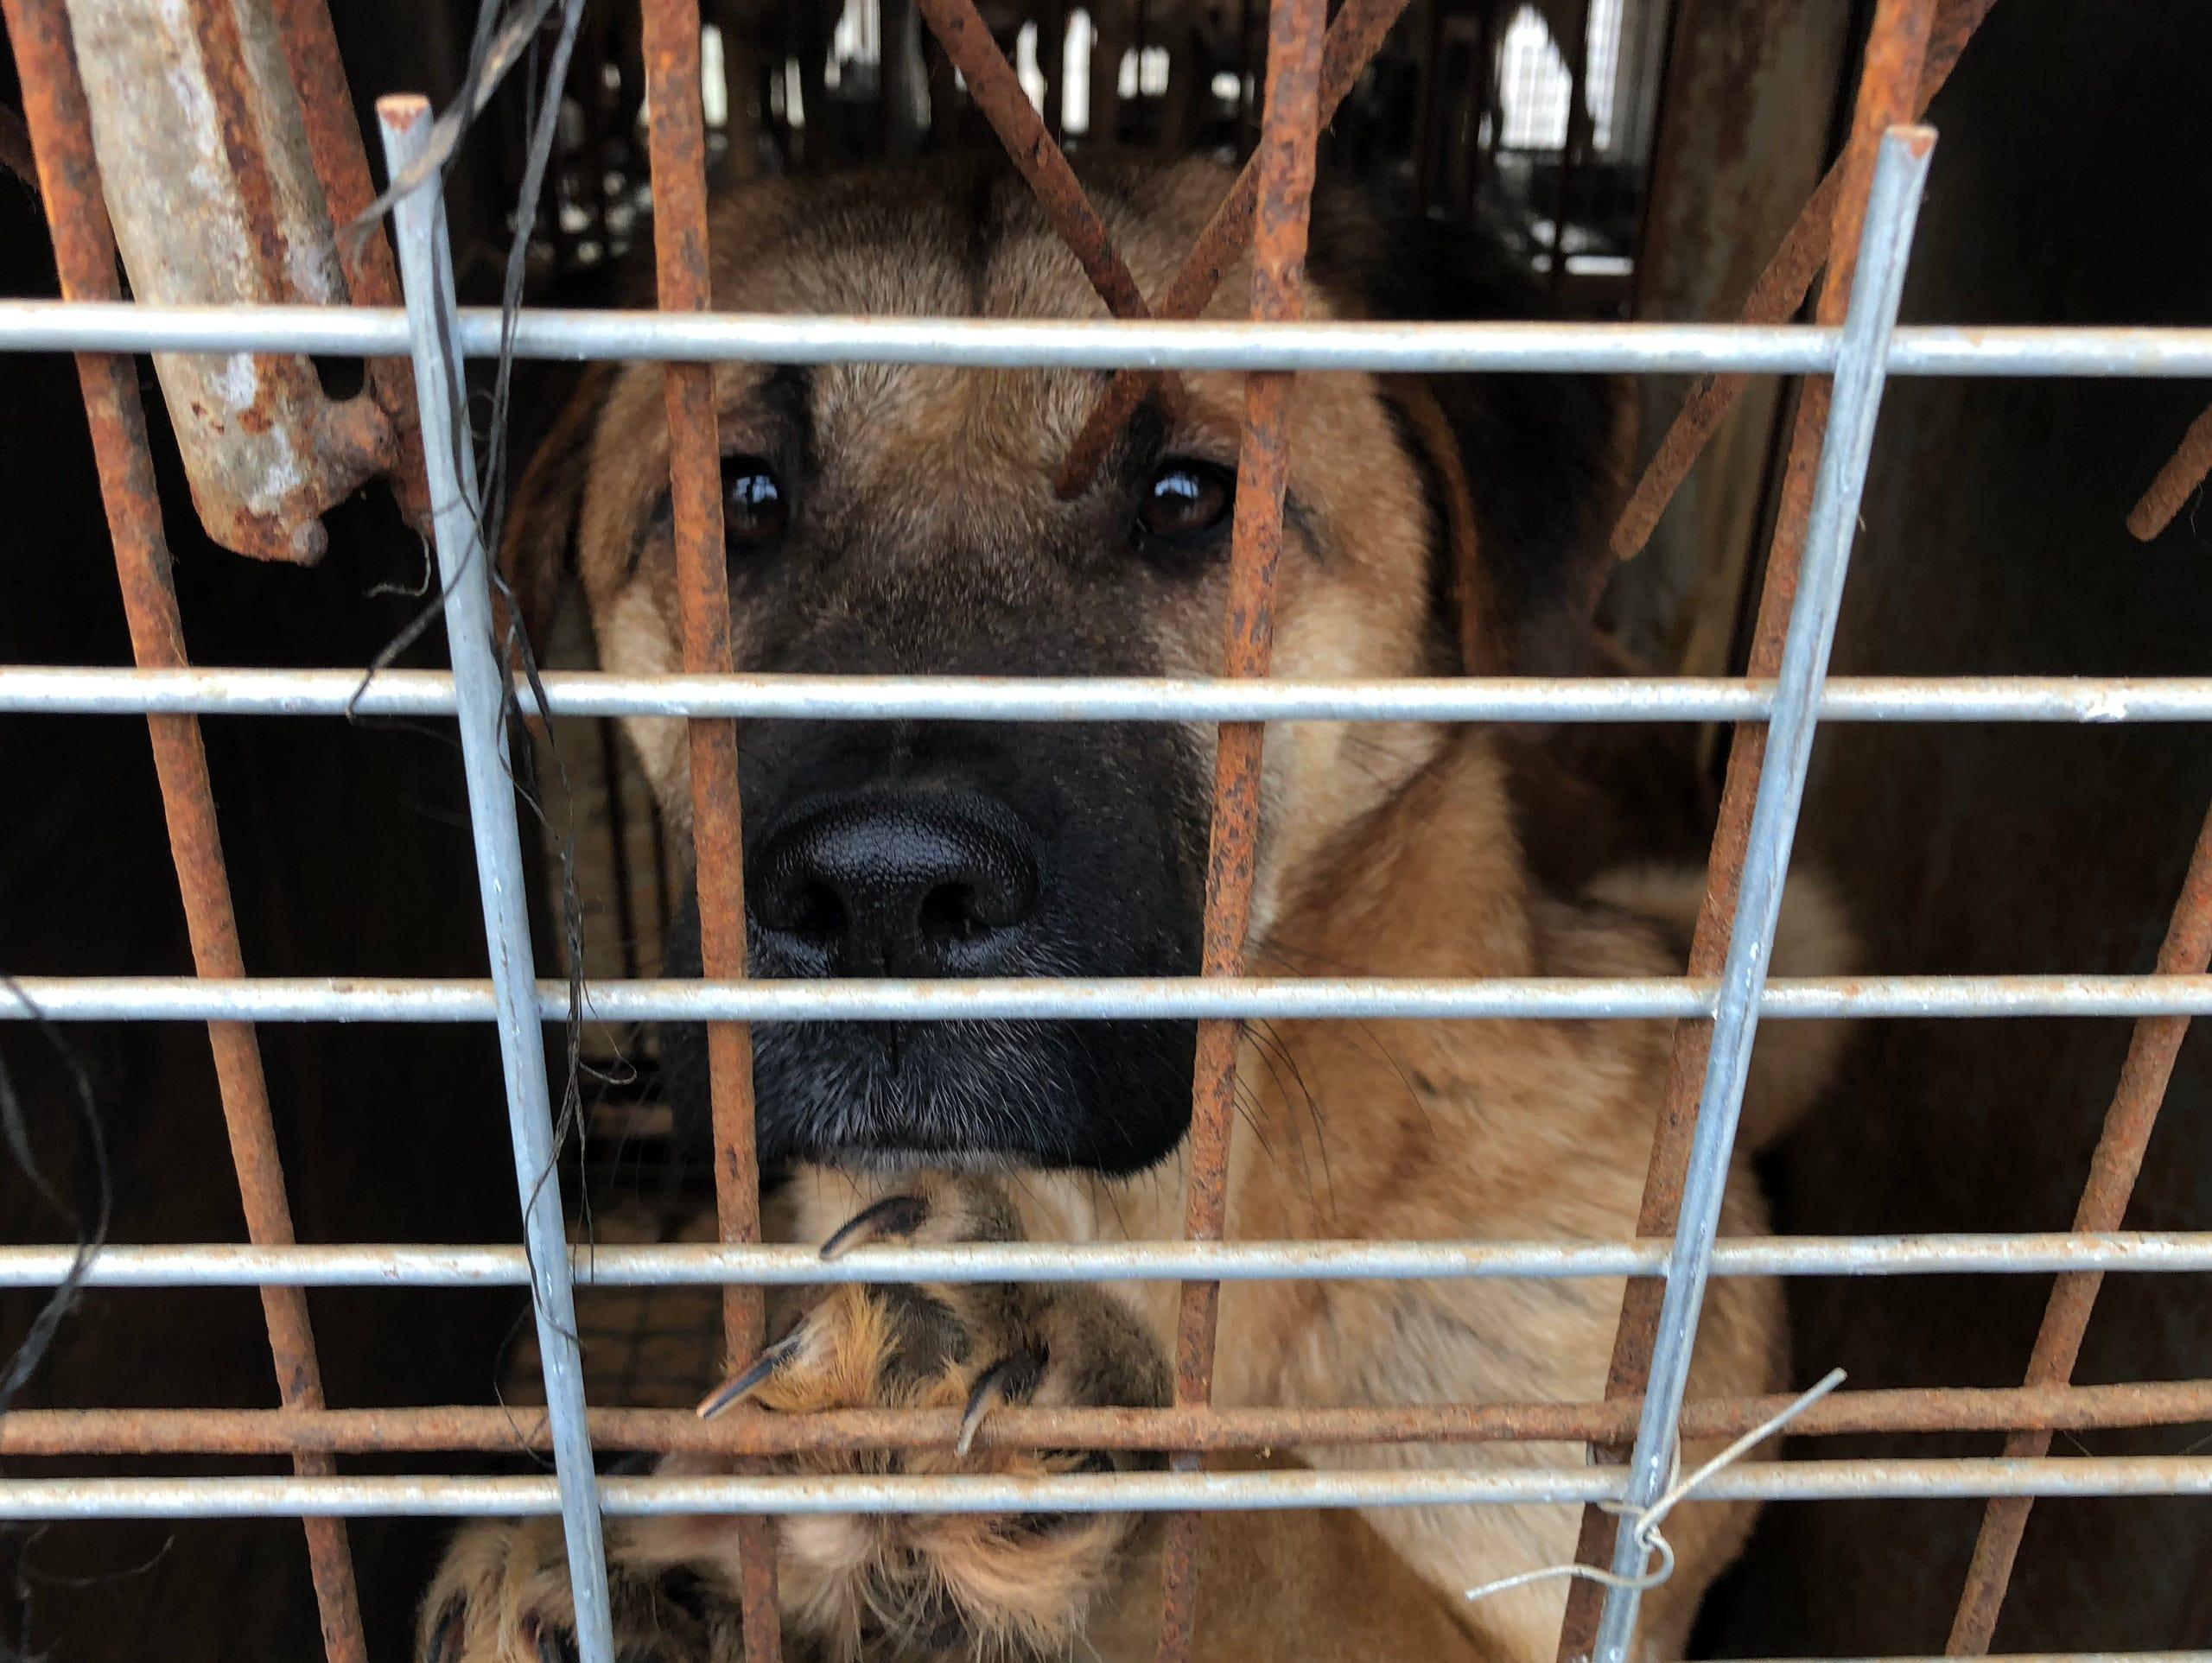 7a0bc6dd A dog looks out from a cage at a dog farm in South Korea.